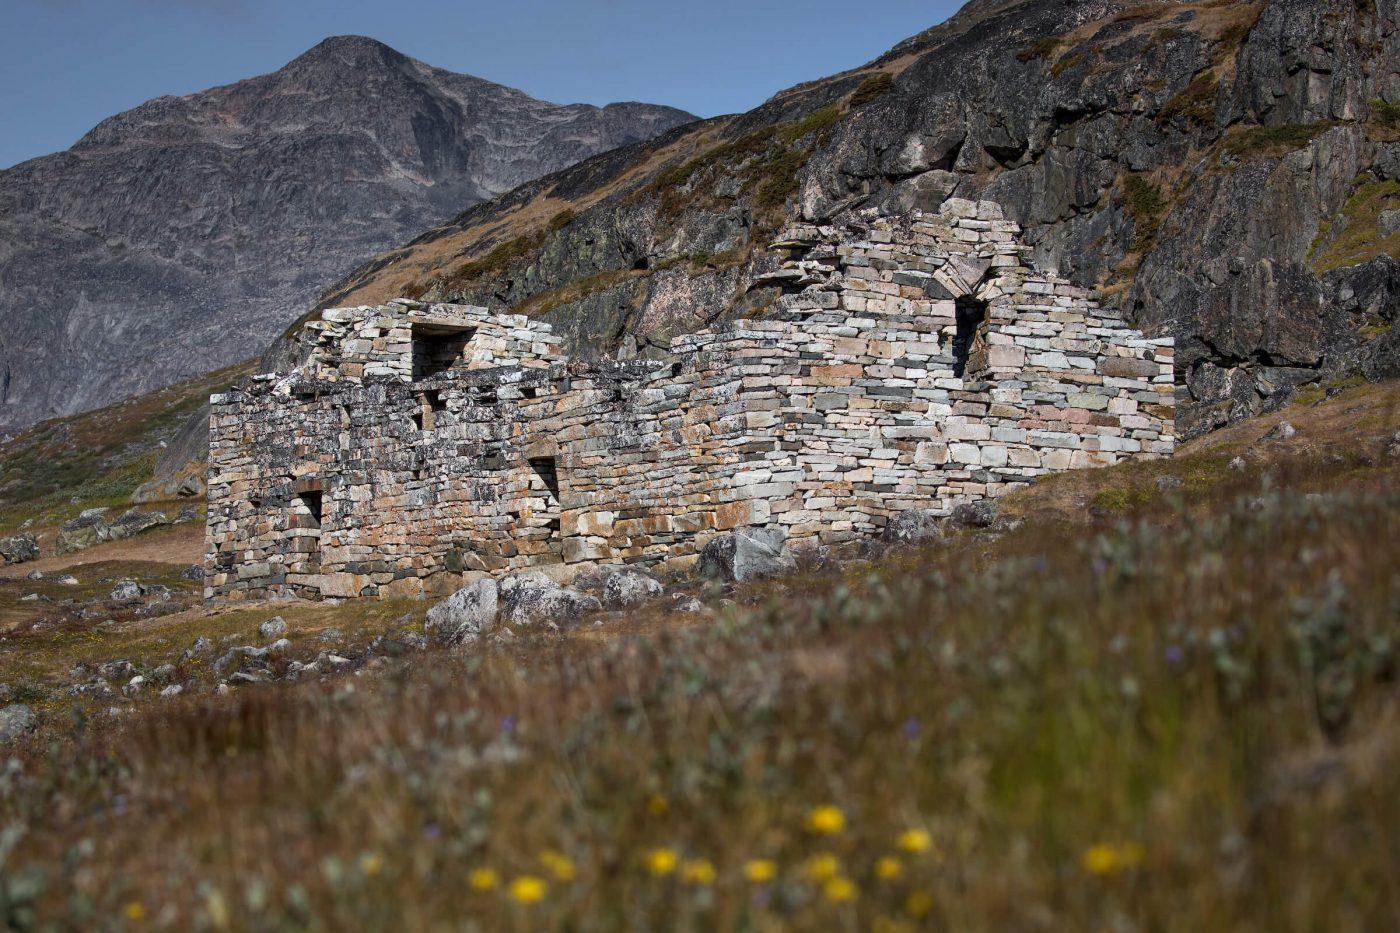 The Hvalsey church ruin near Qaqortoq in South Greenland. By Mads Pihl